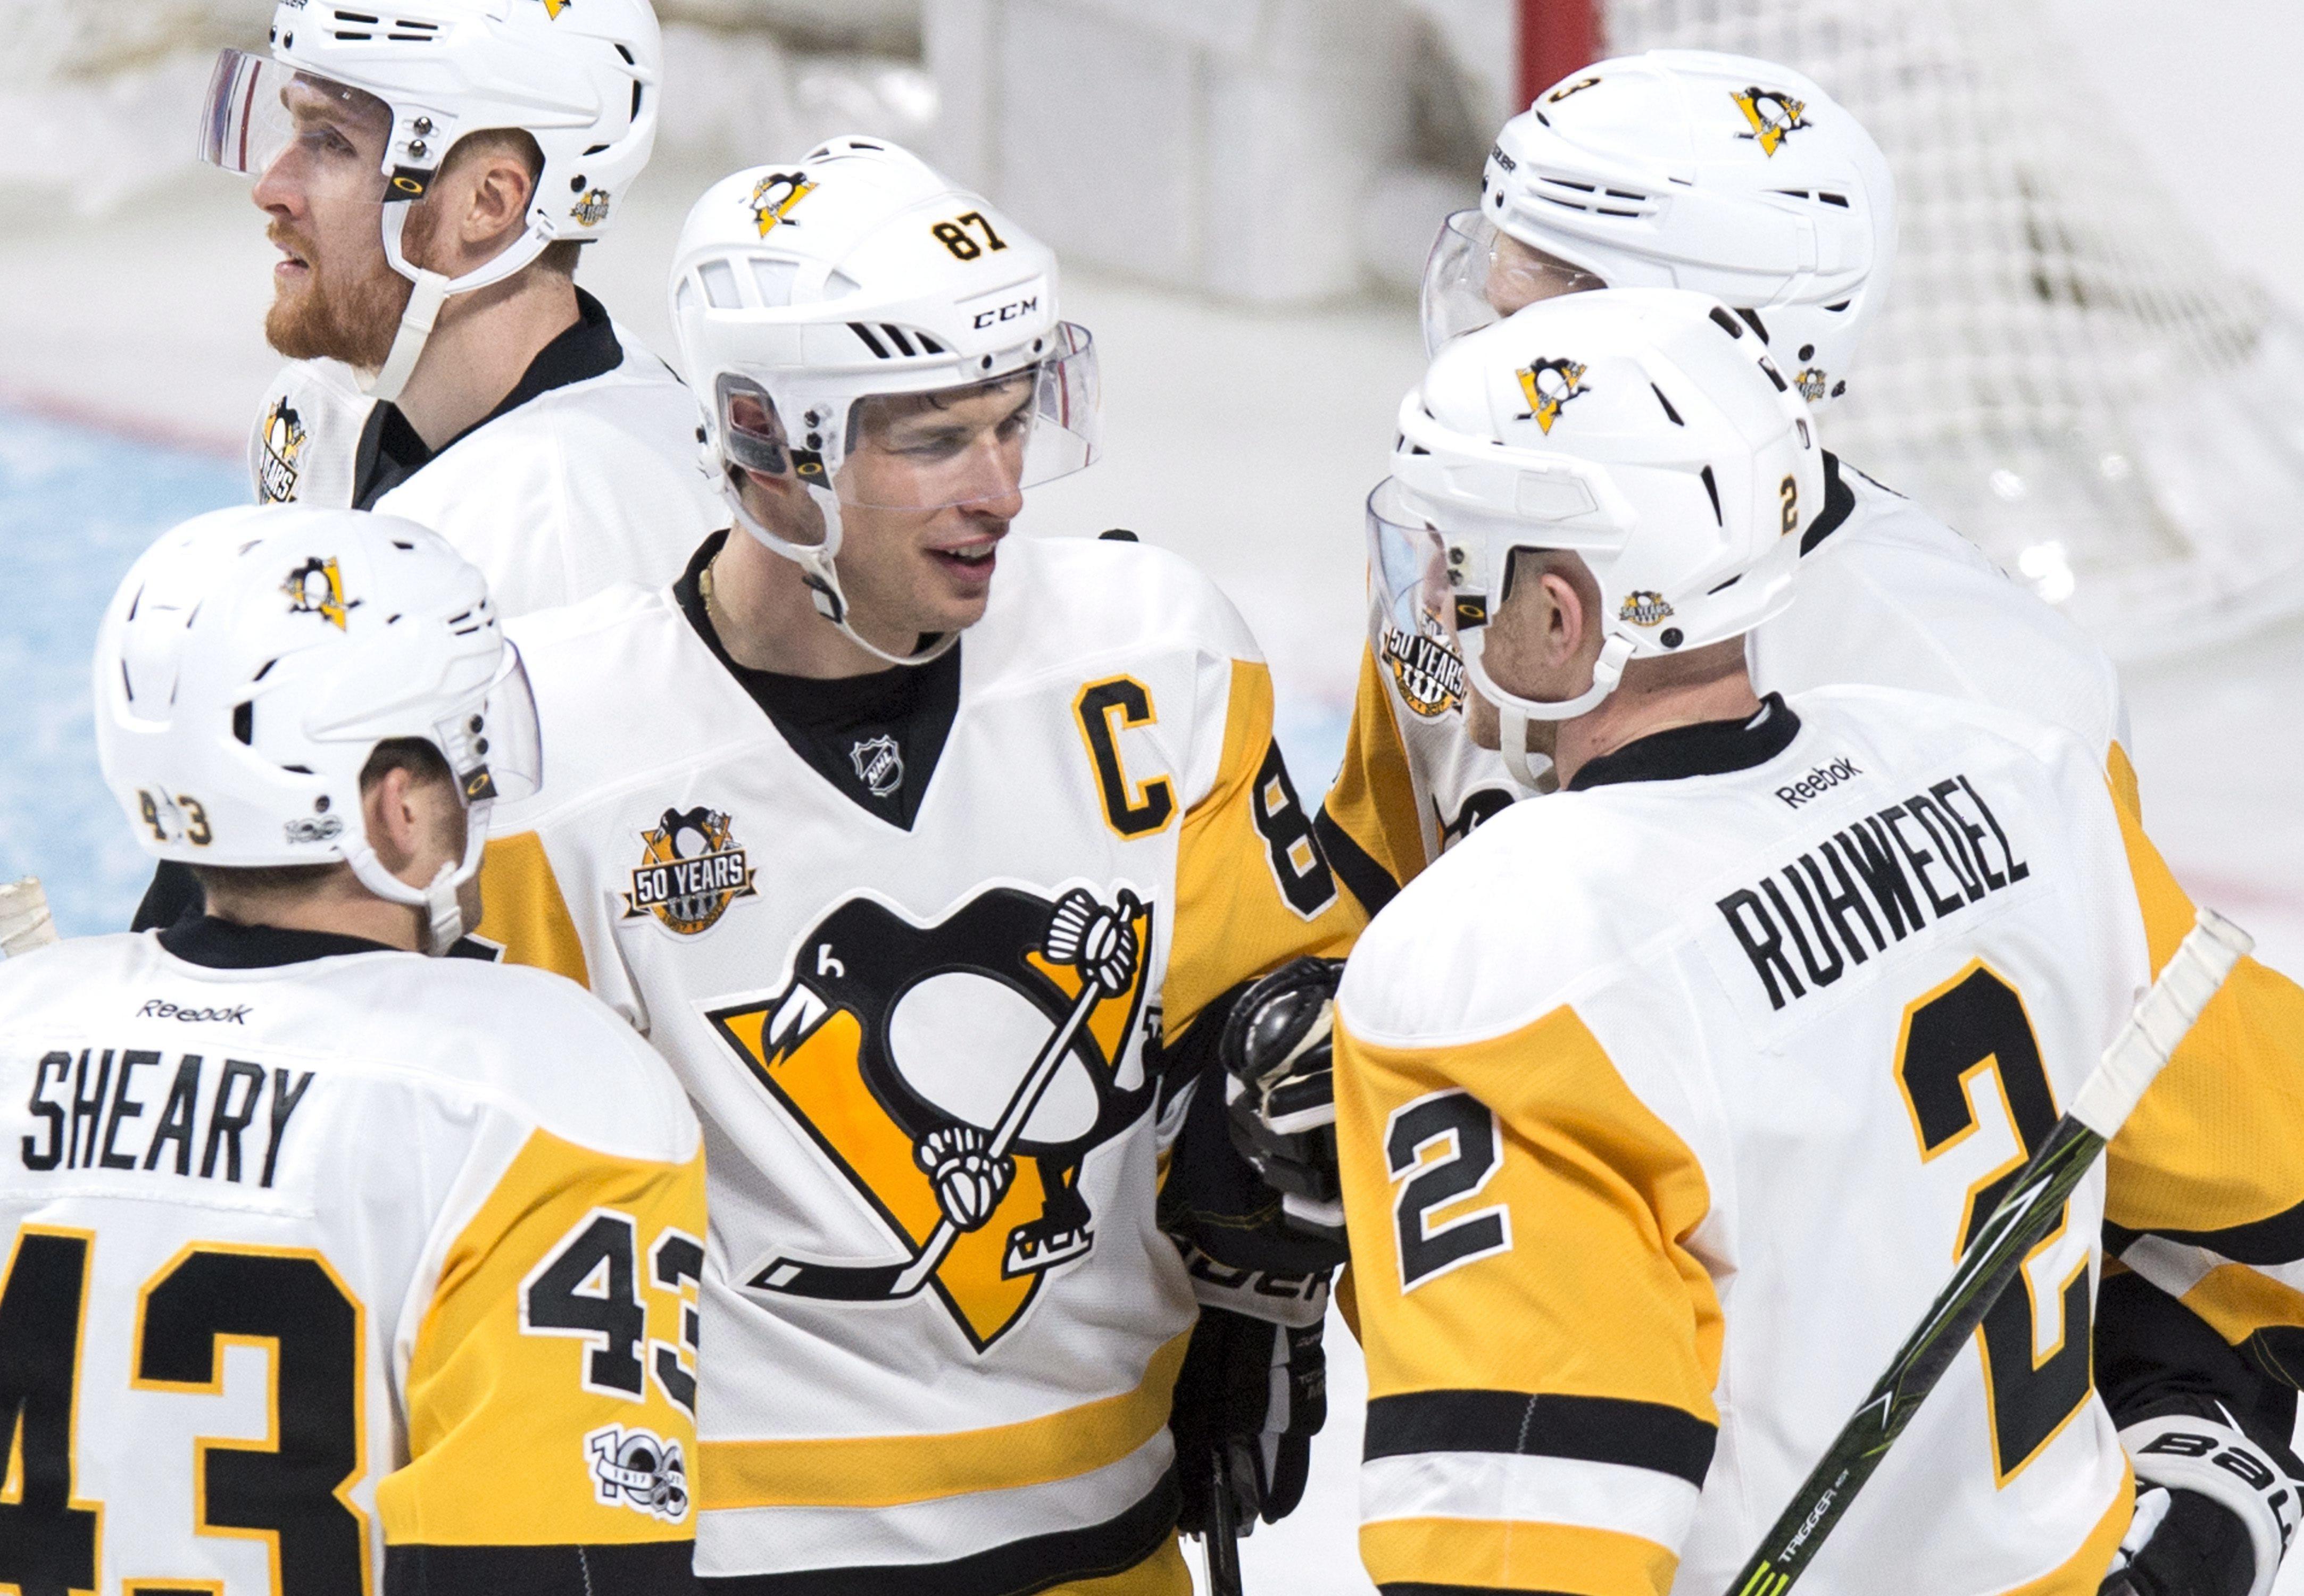 Penguins_canadiens_hockey_04438